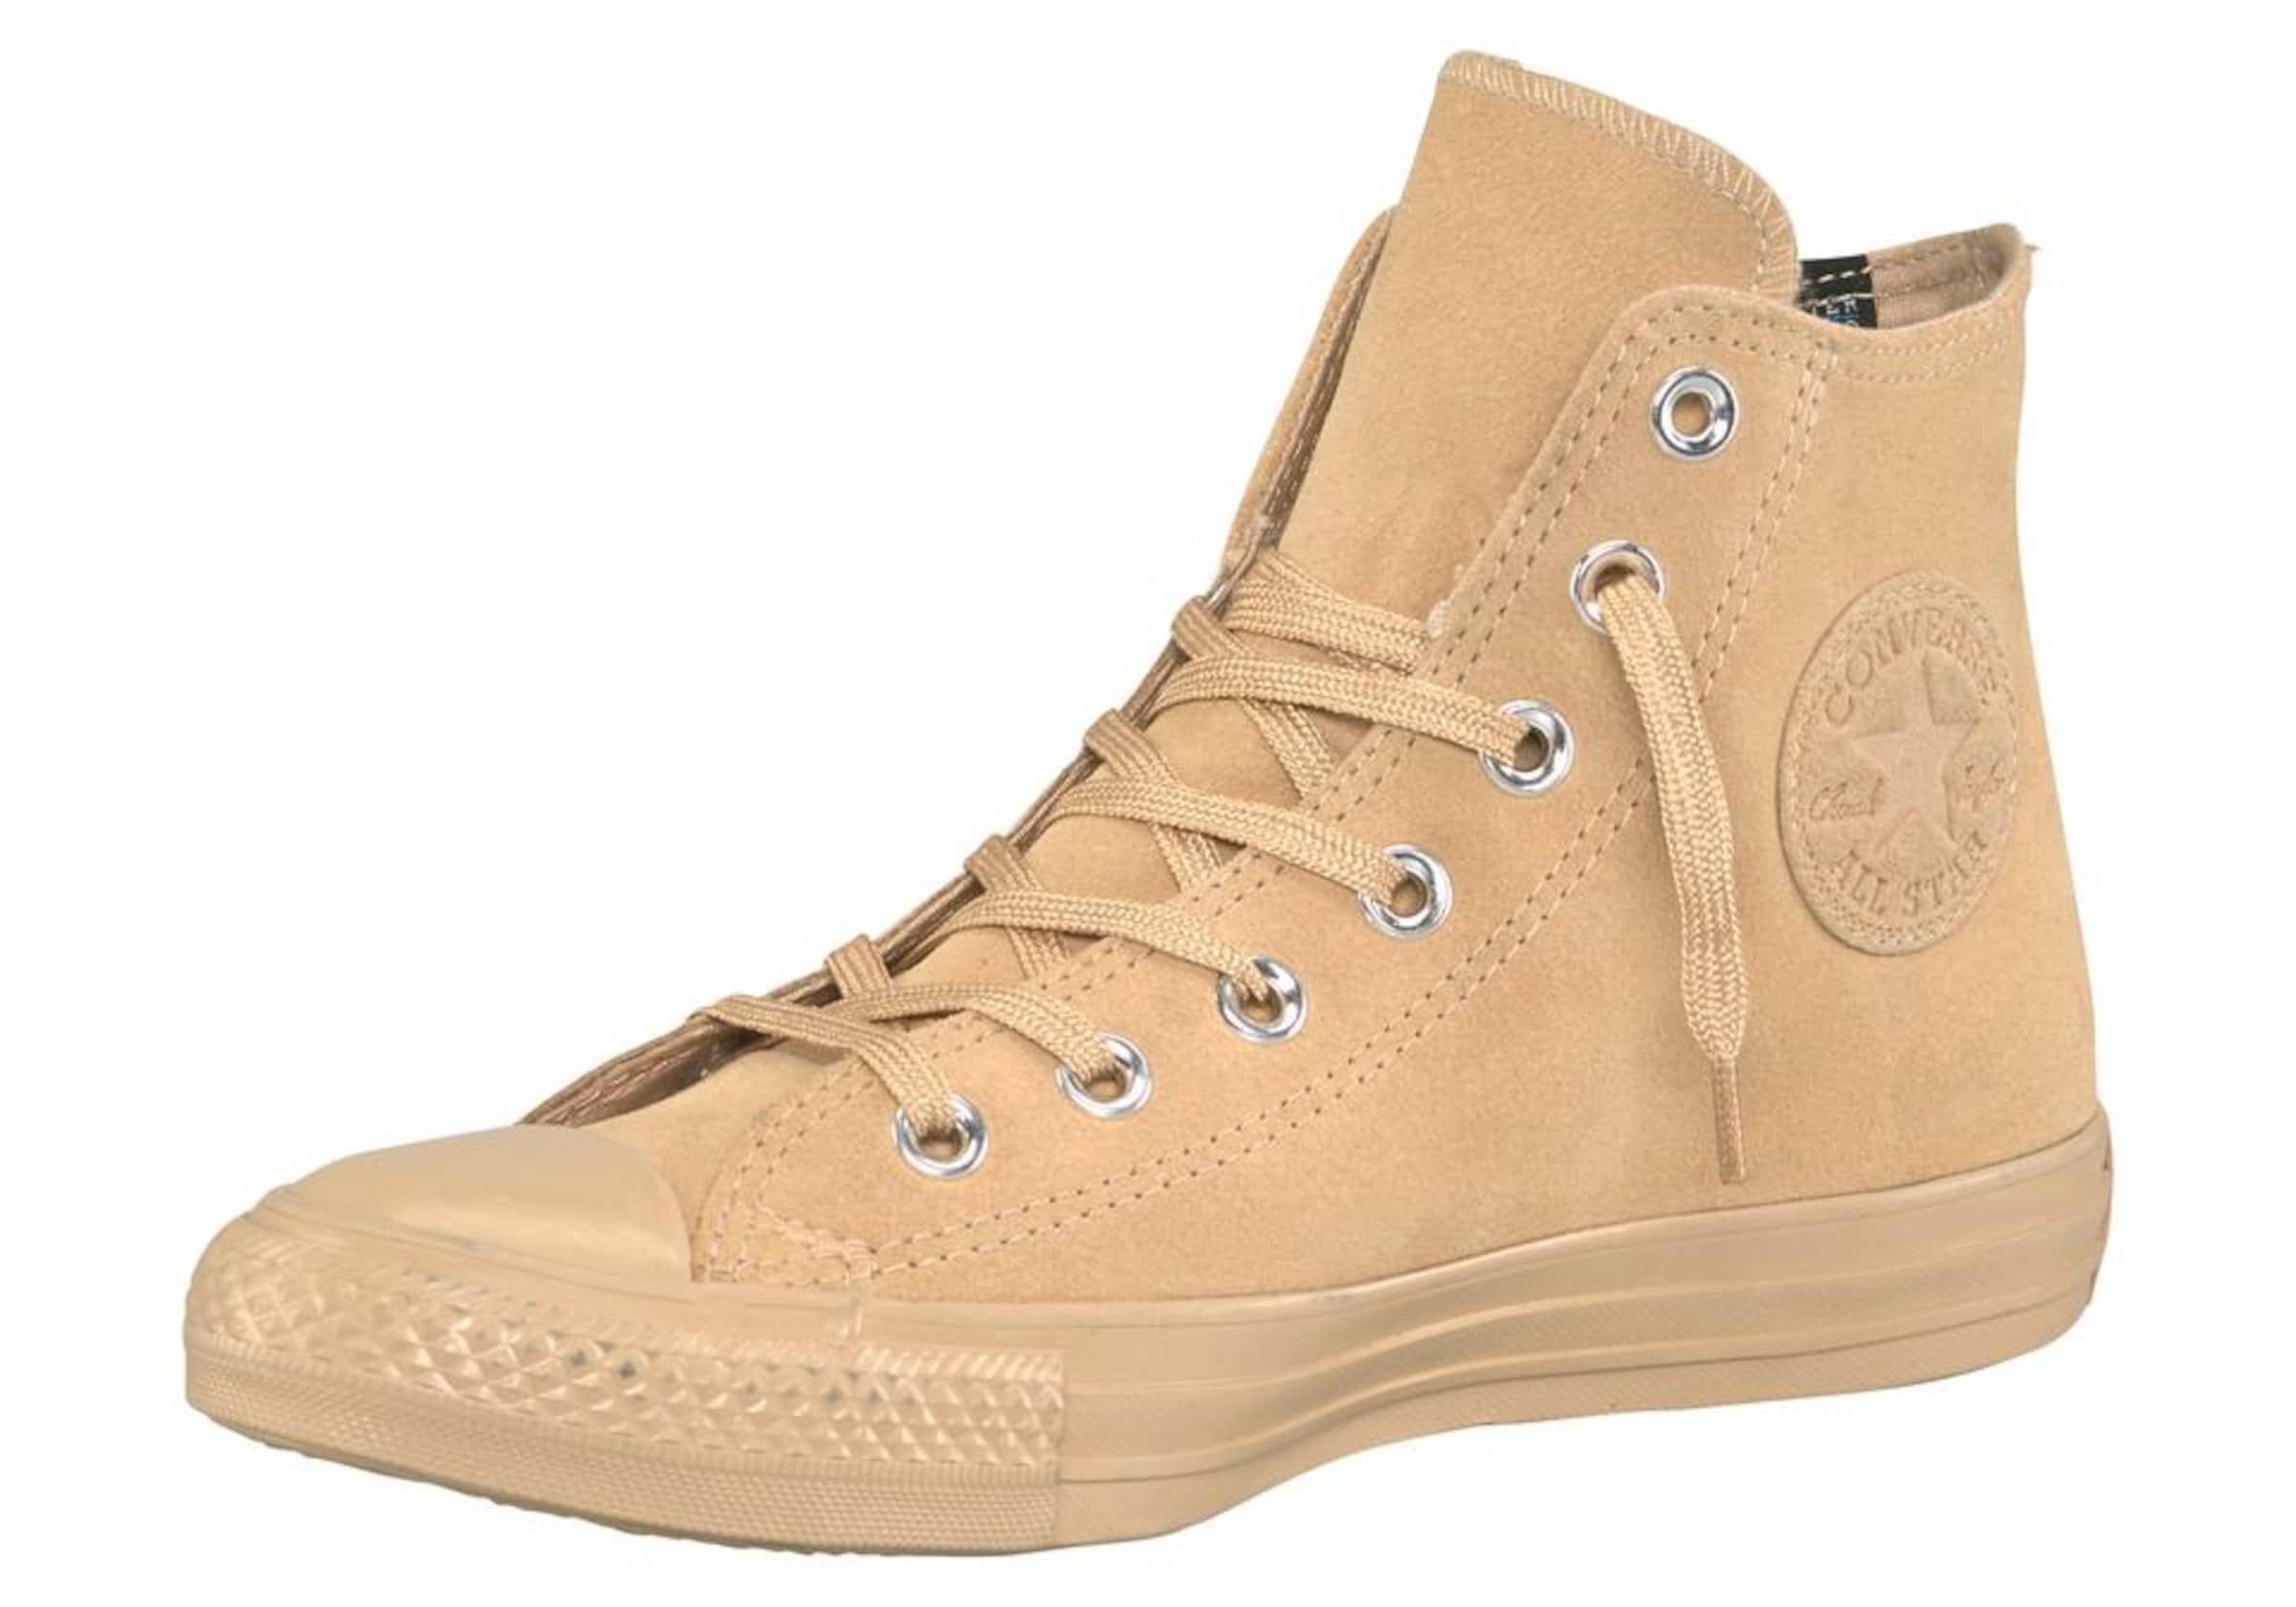 Neuesten Kollektionen Zu Verkaufen CONVERSE 'Chuck Taylor All' Sneaker Für Günstig Online Günstig Kaufen Angebot Finden Online-Großen Verkauf viF99E5e